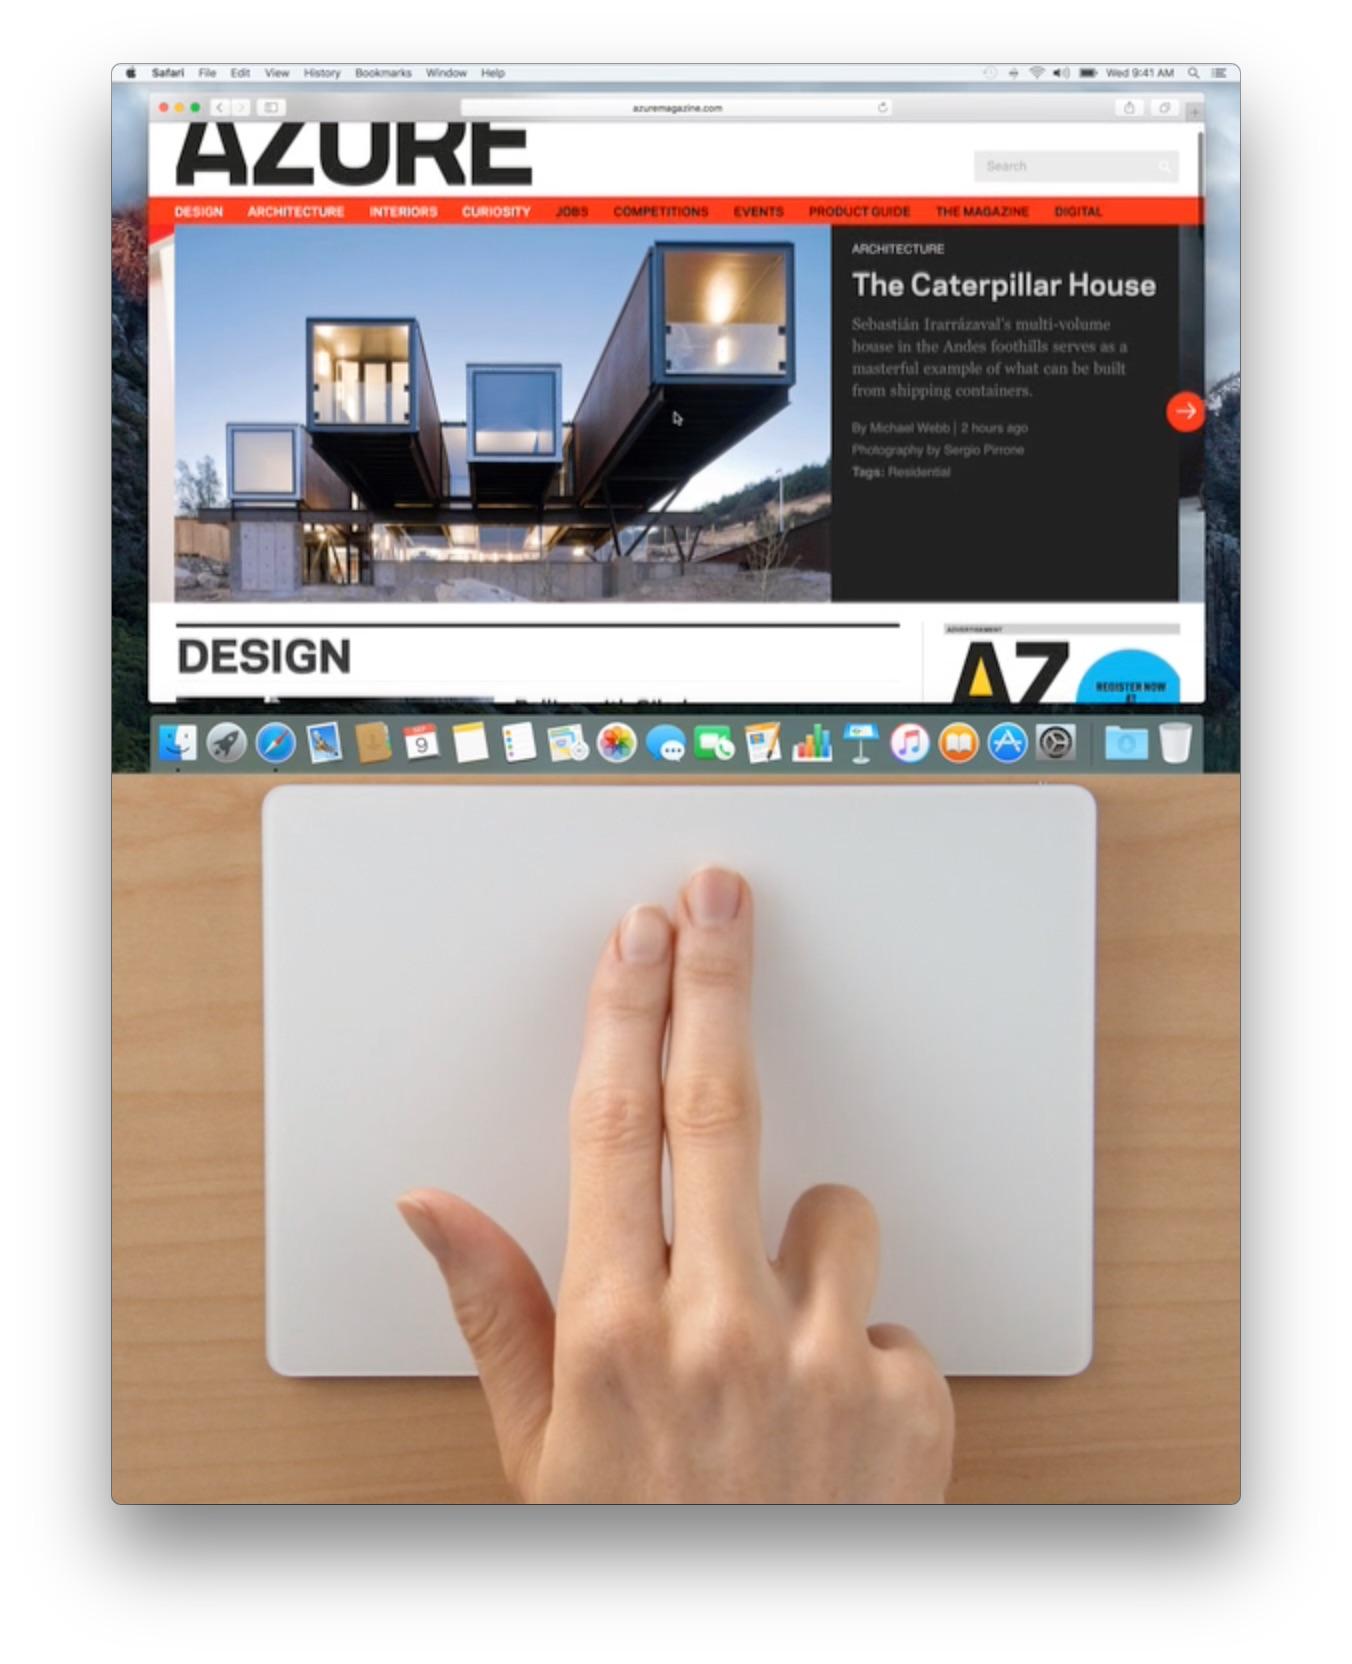 Magic-Trackpad-2-How-to-Use